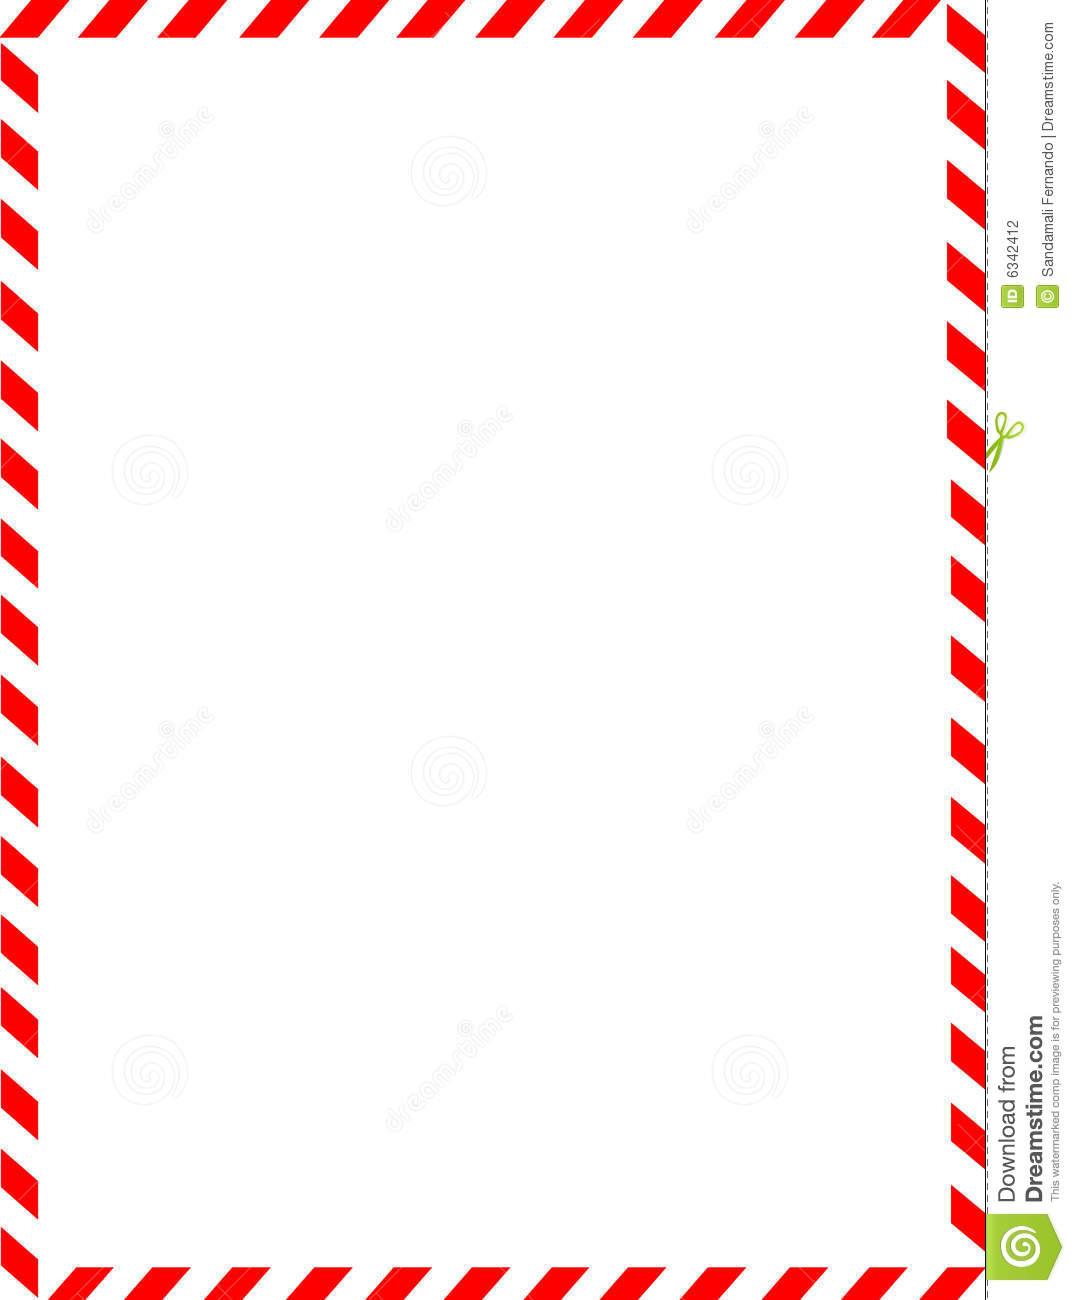 1075x1300 candy cane border clip art free - Christmas Borders Free